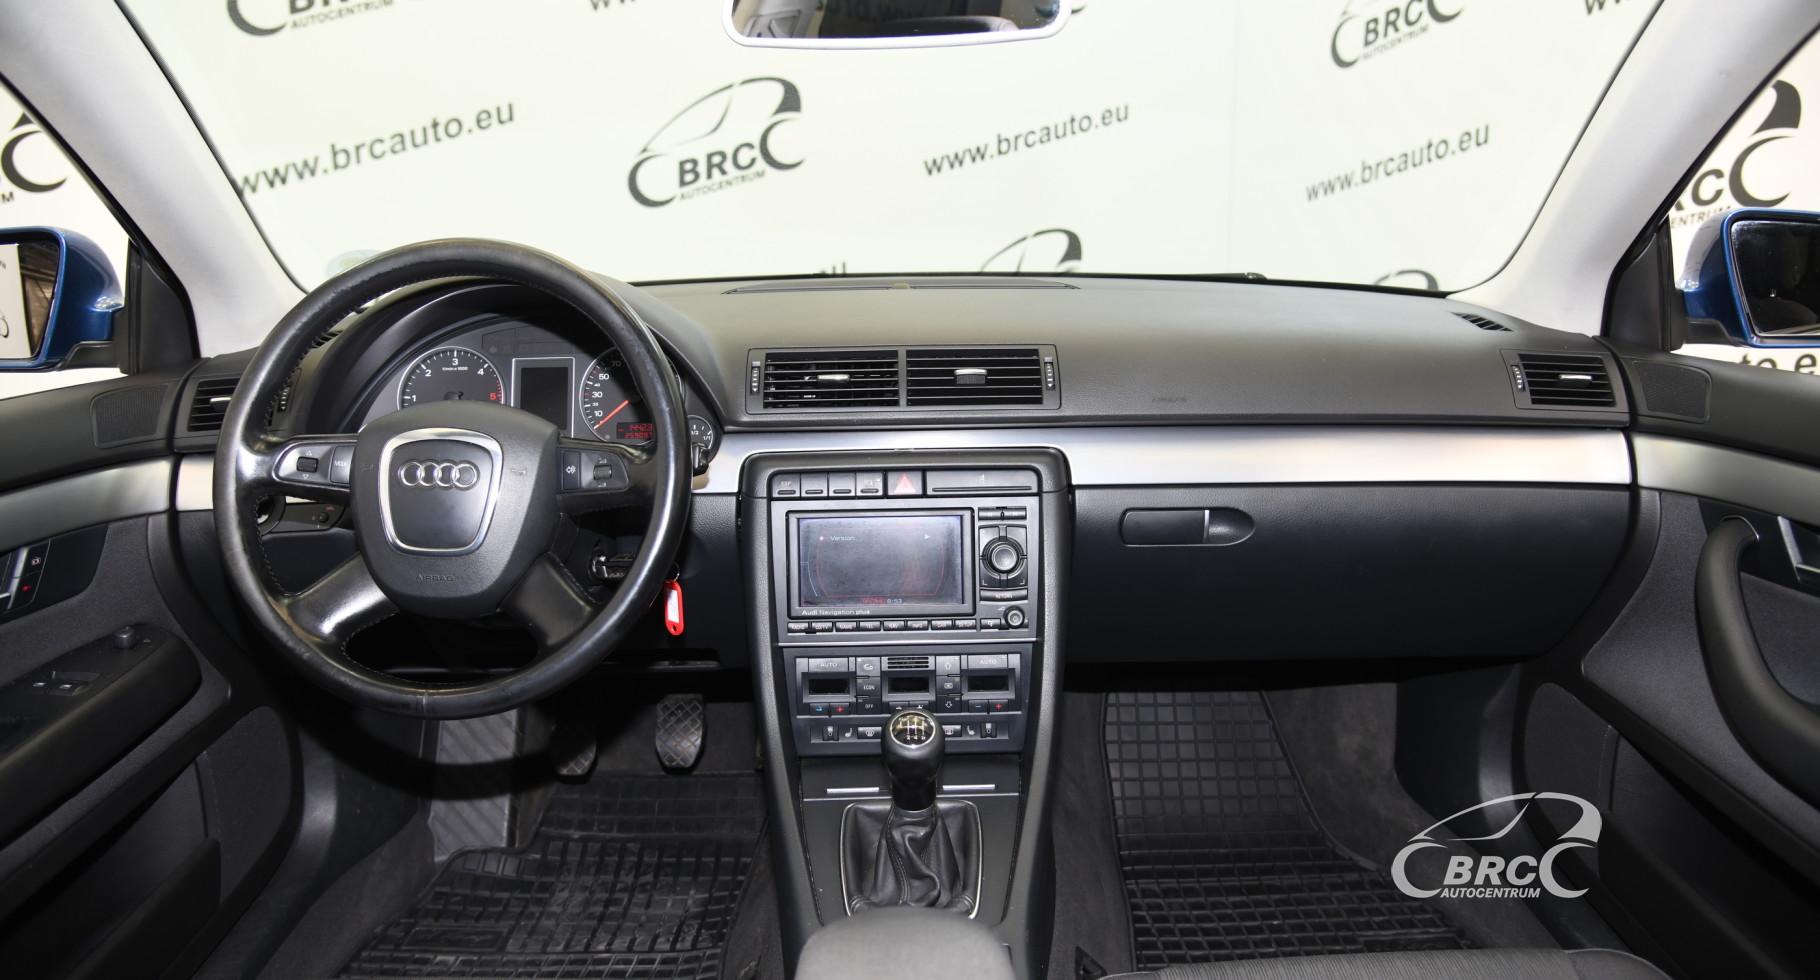 Audi A4 2.0 TDI Variant